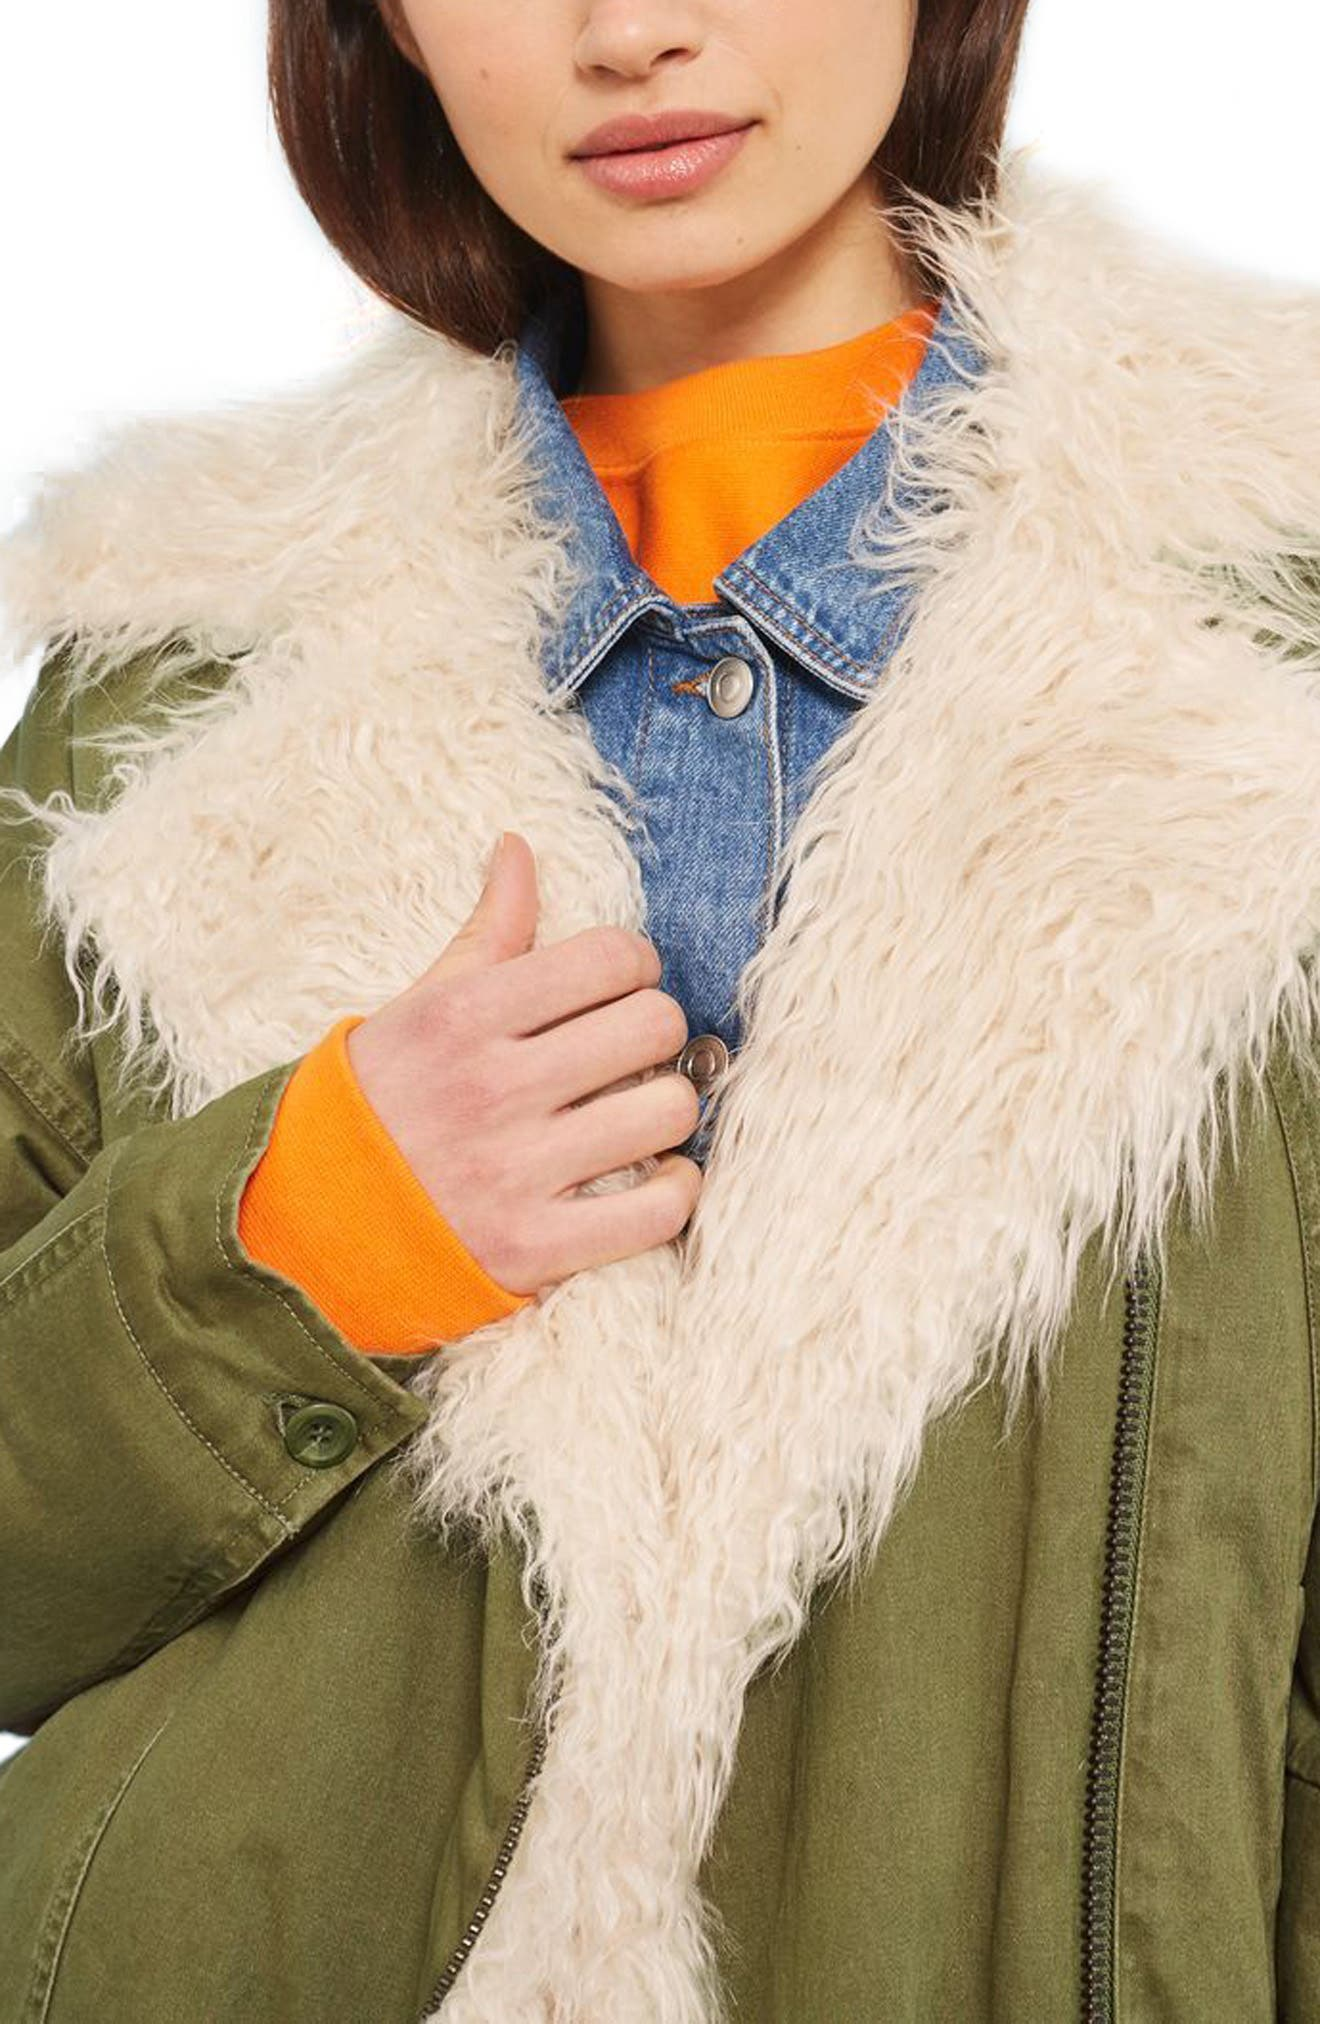 Jake Faux Fur Lined Jacket,                         Main,                         color, 300